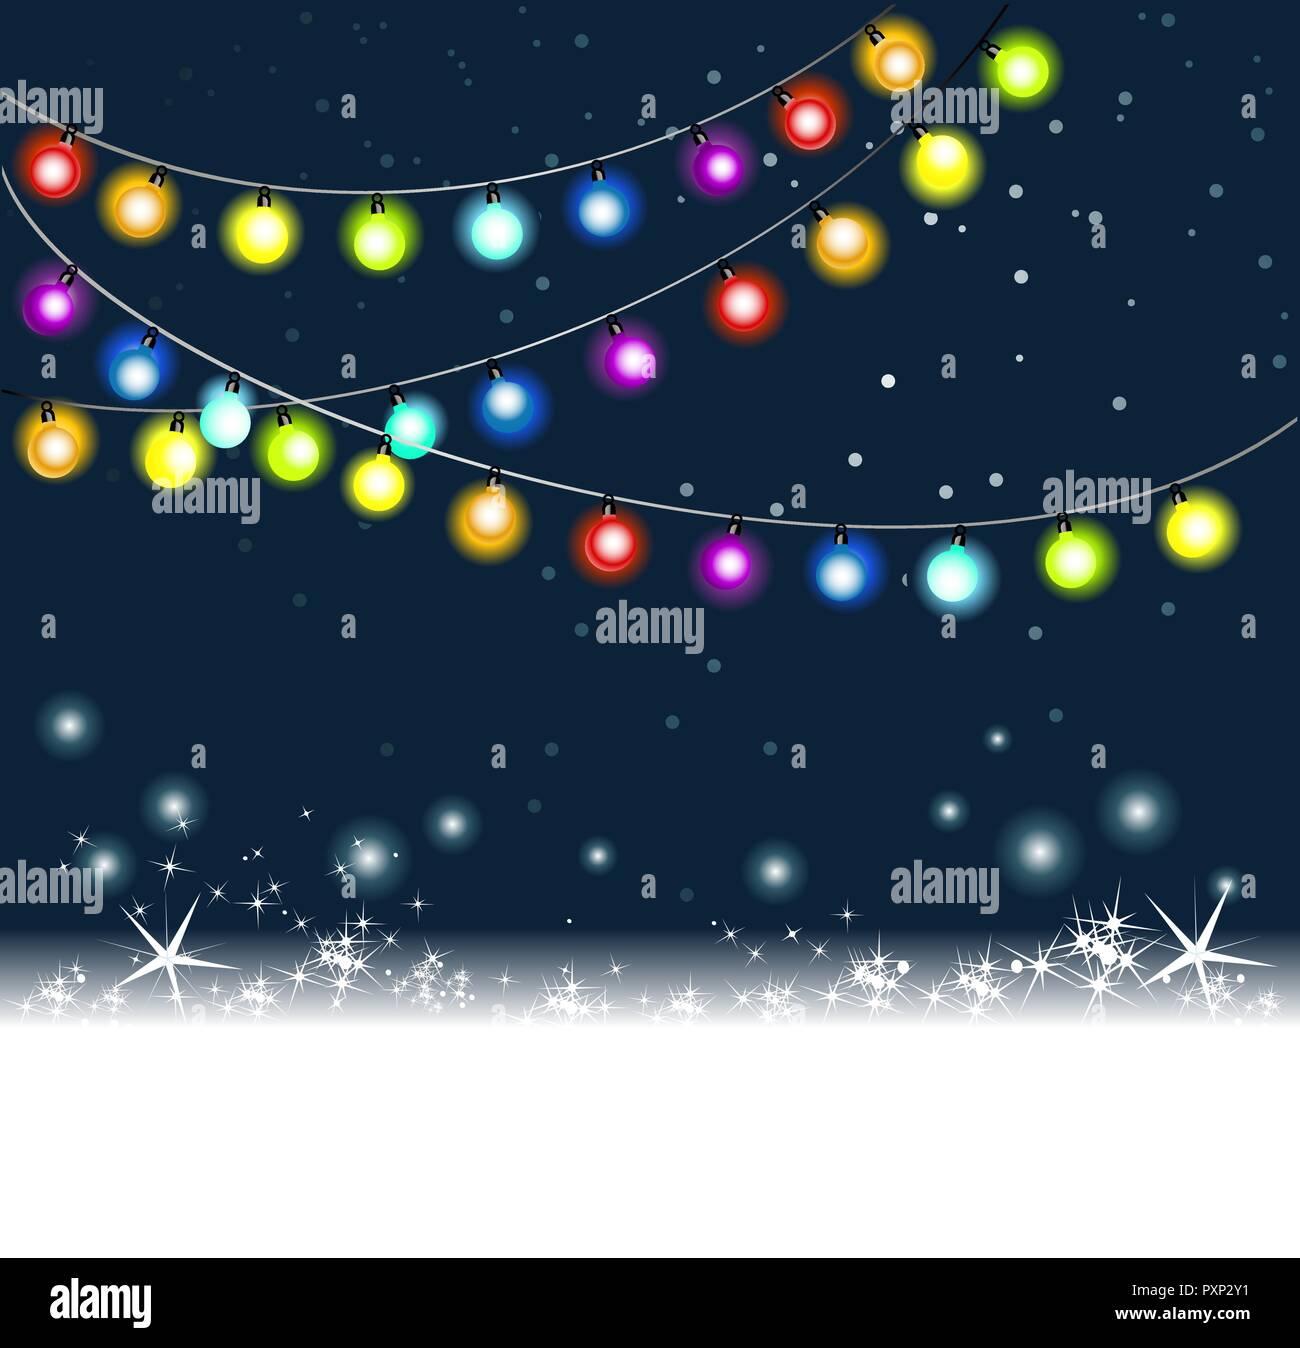 Christmas Background With Rainbow Christmas Tree Lights Stock Vector